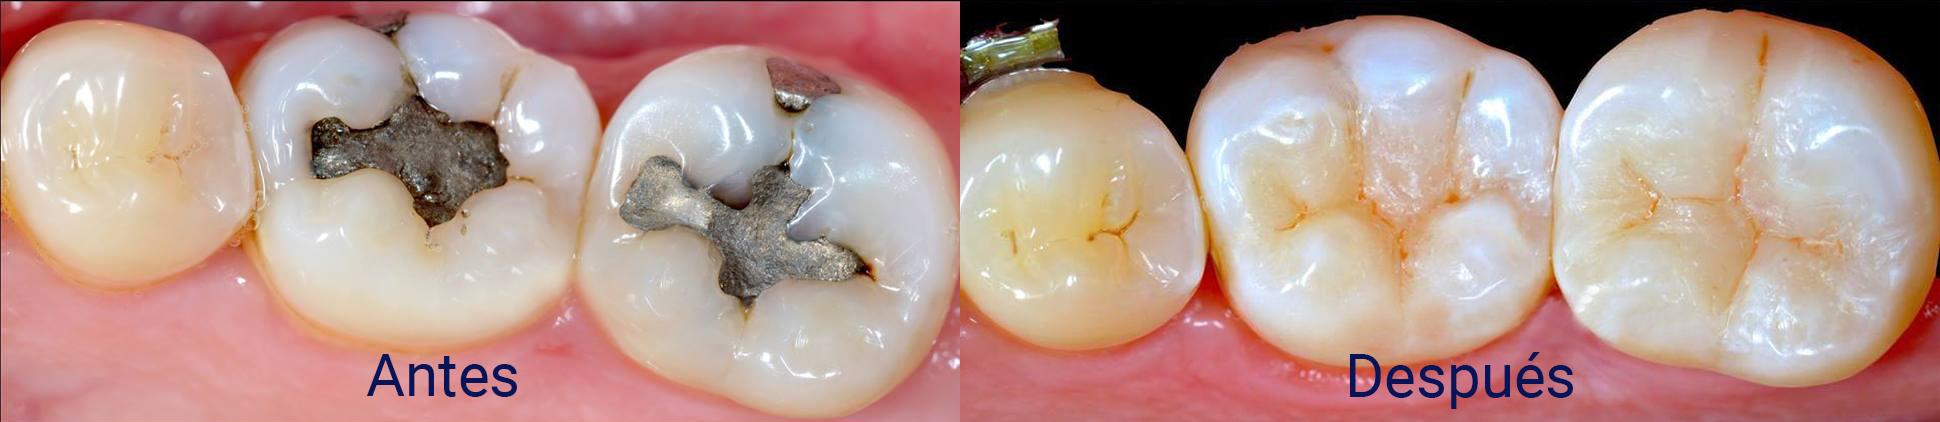 rehabilitacion-antes-despues-dentista